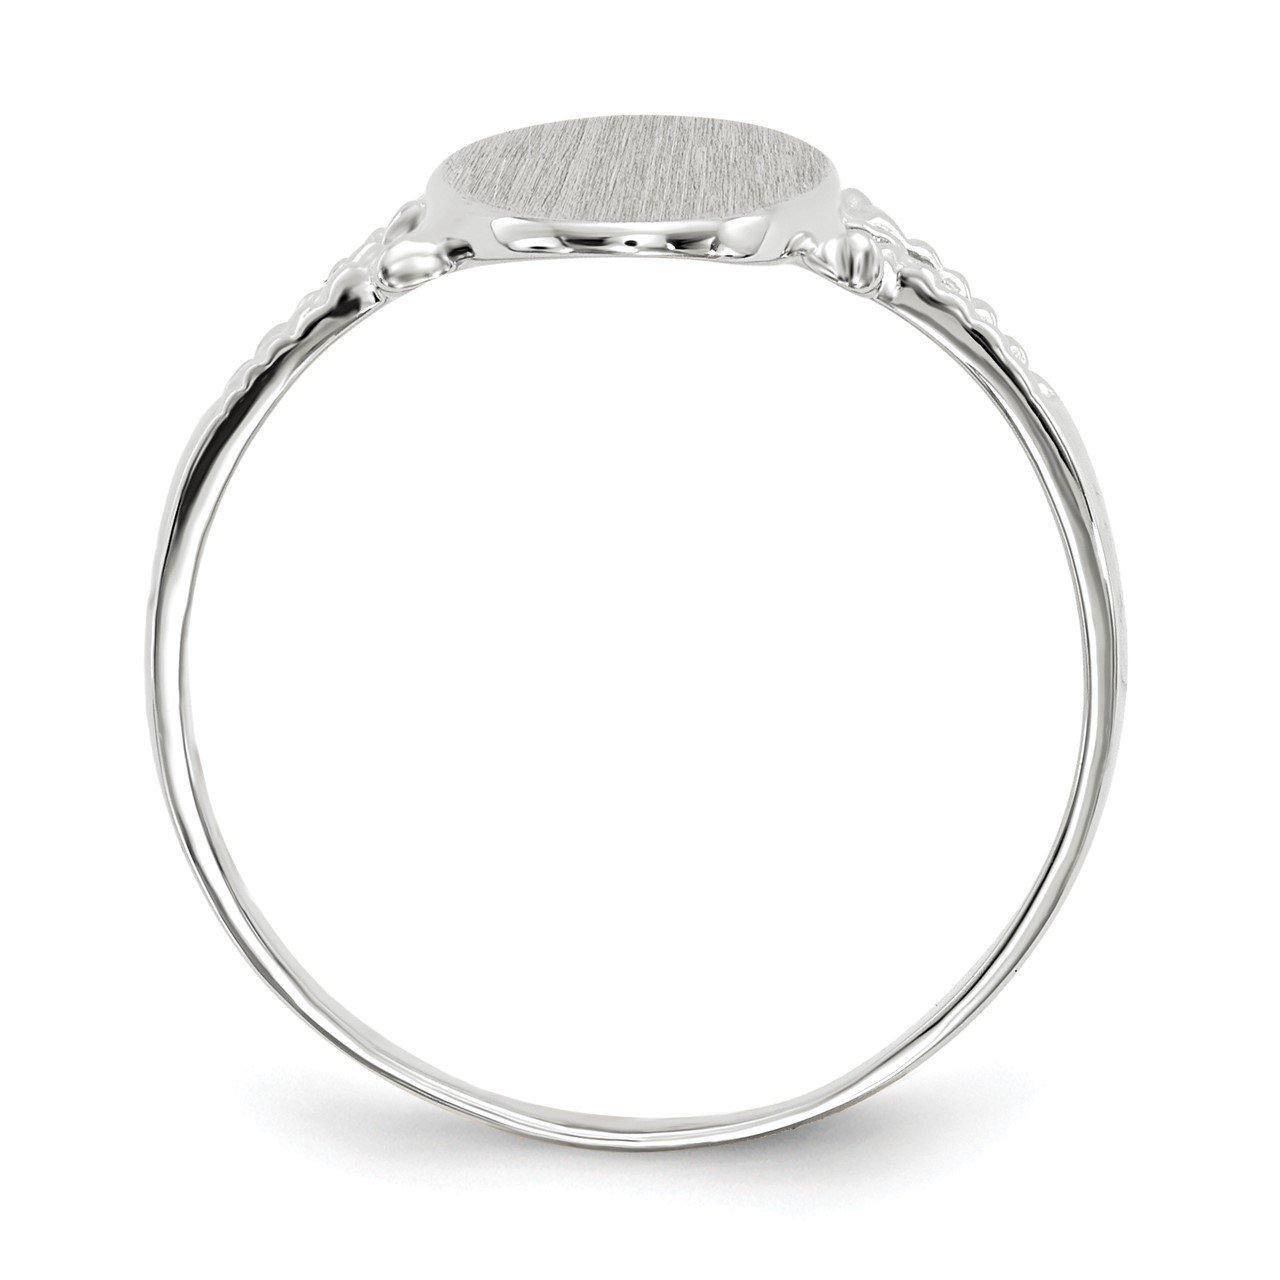 14k White Gold 13.5x8.5mm Closed Back Signet Ring-1